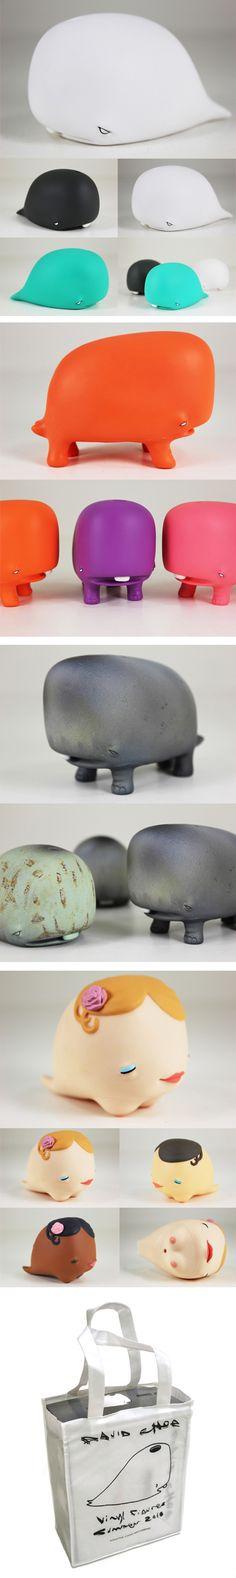 David Choe Munko figures. I want them all!